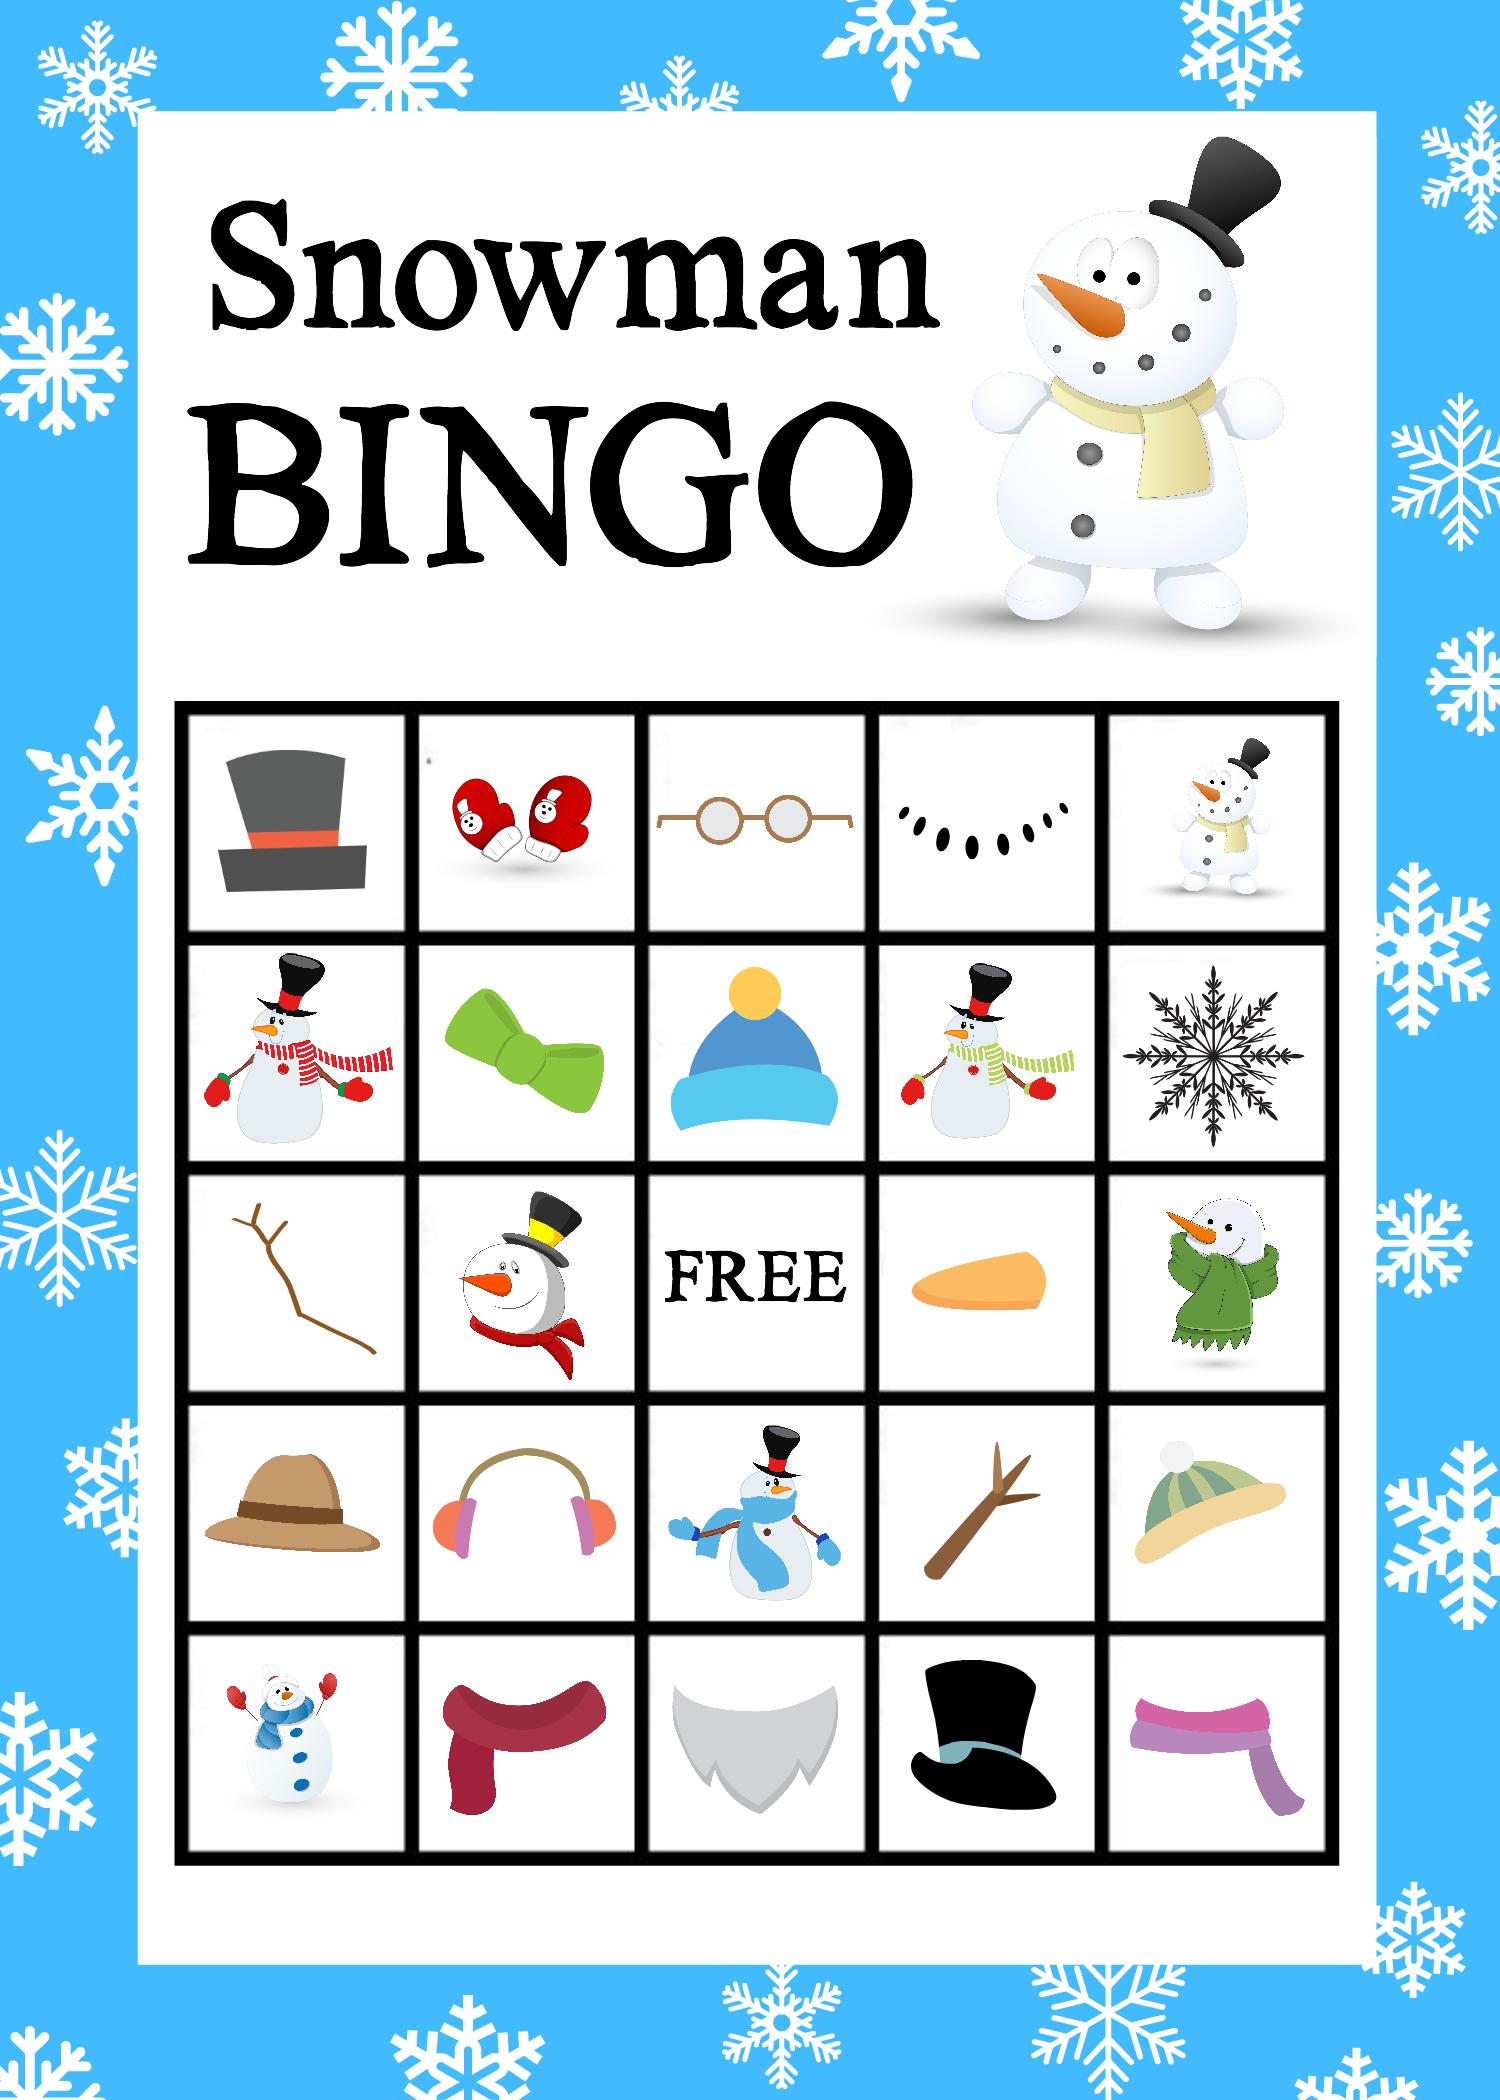 Printable Snowman Bingo Game - Crazy Little Projects - Free Printable Bingo Games